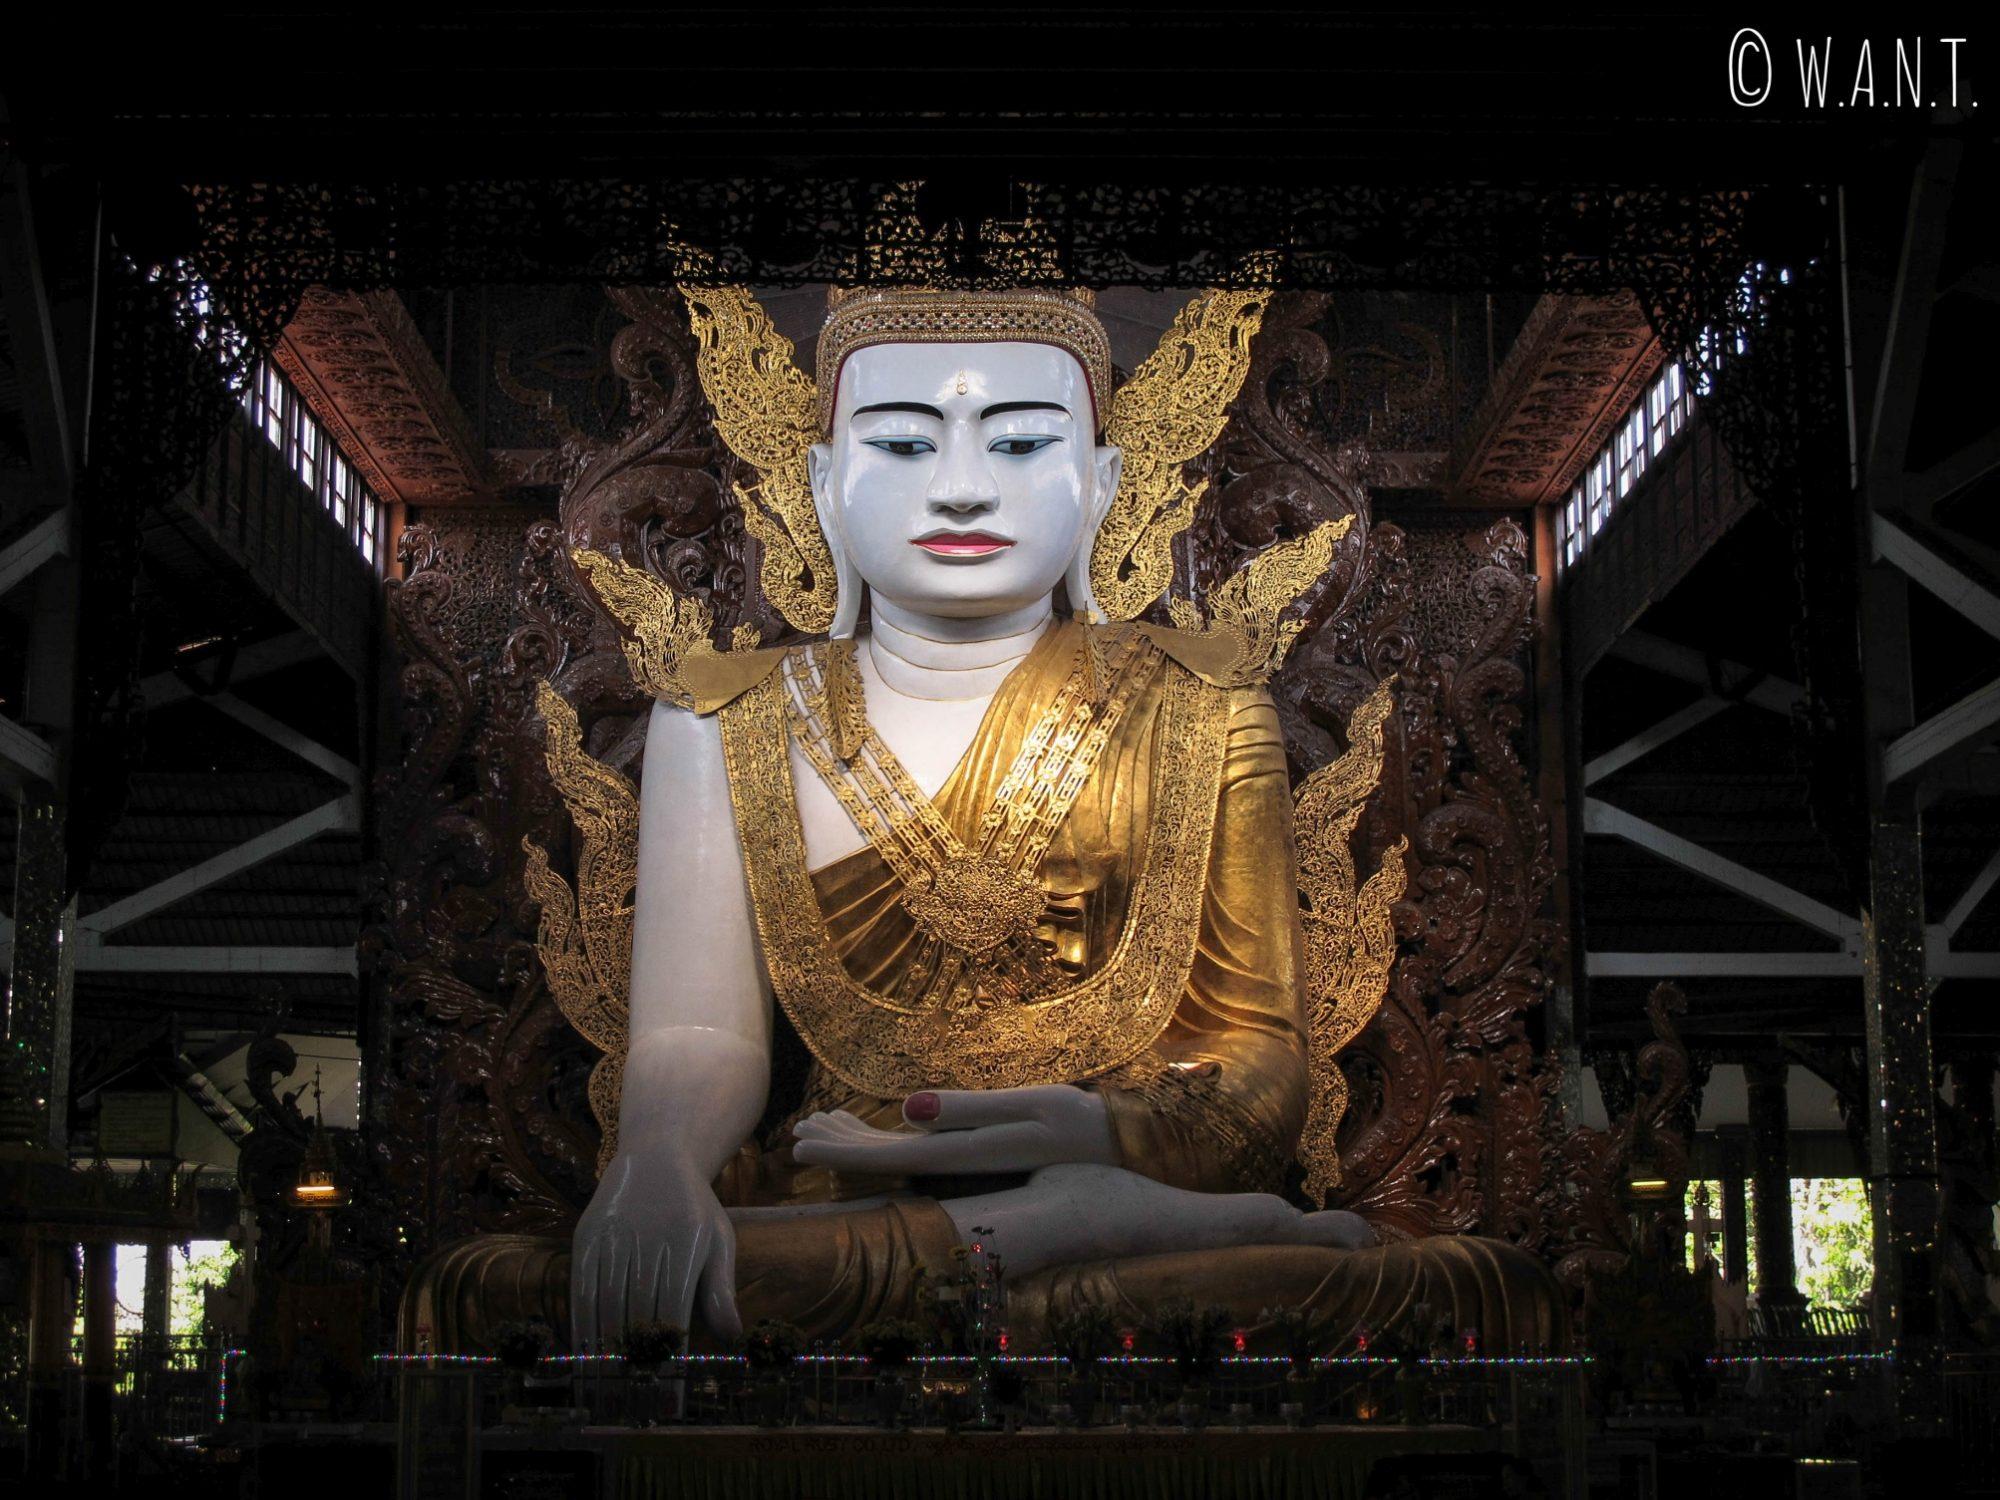 Gigantesque Bouddha au temple Ngar Htat Gyi